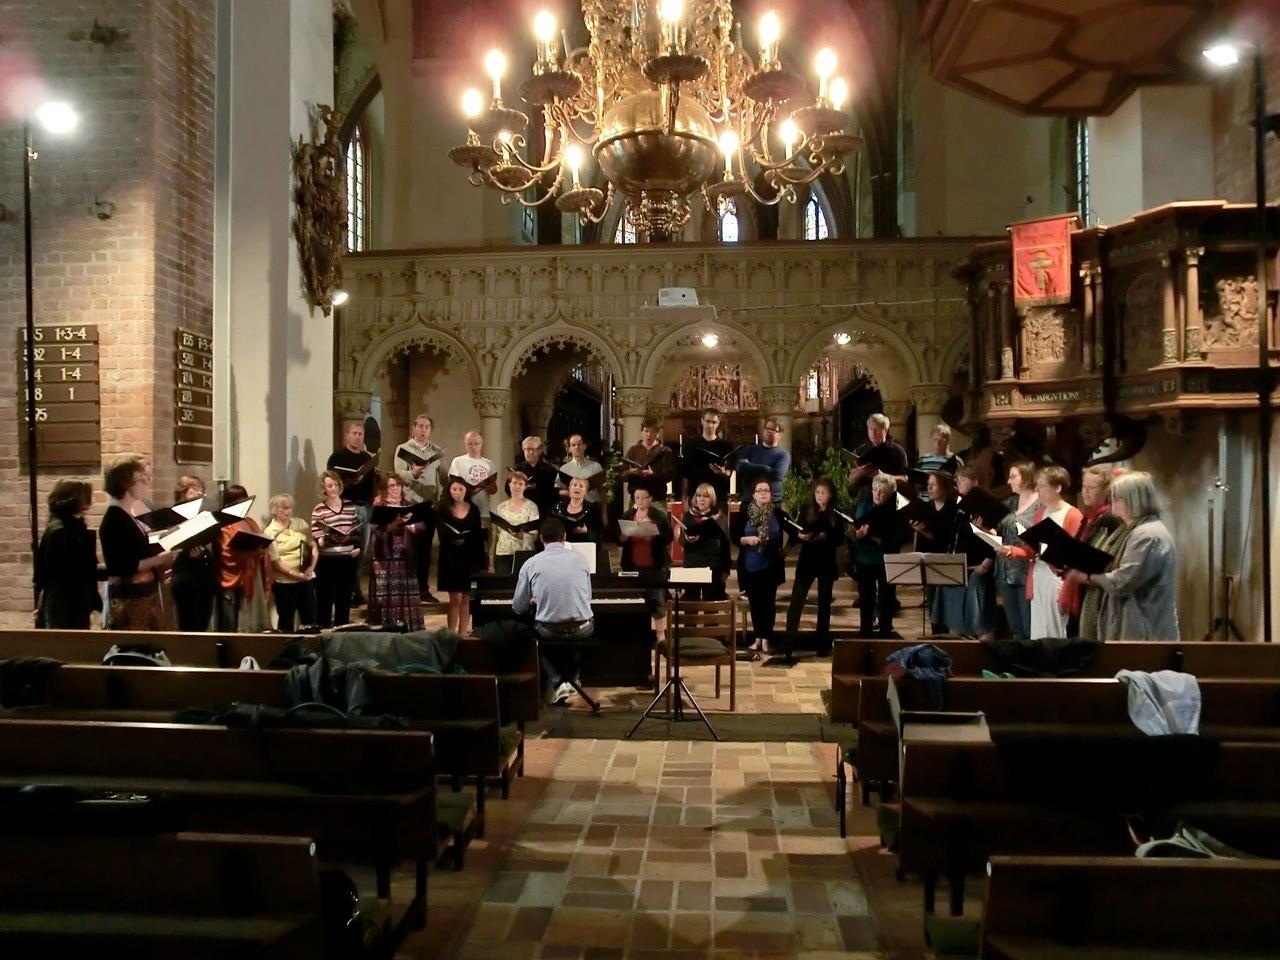 Amadeus-Chor, Meldorf 2012